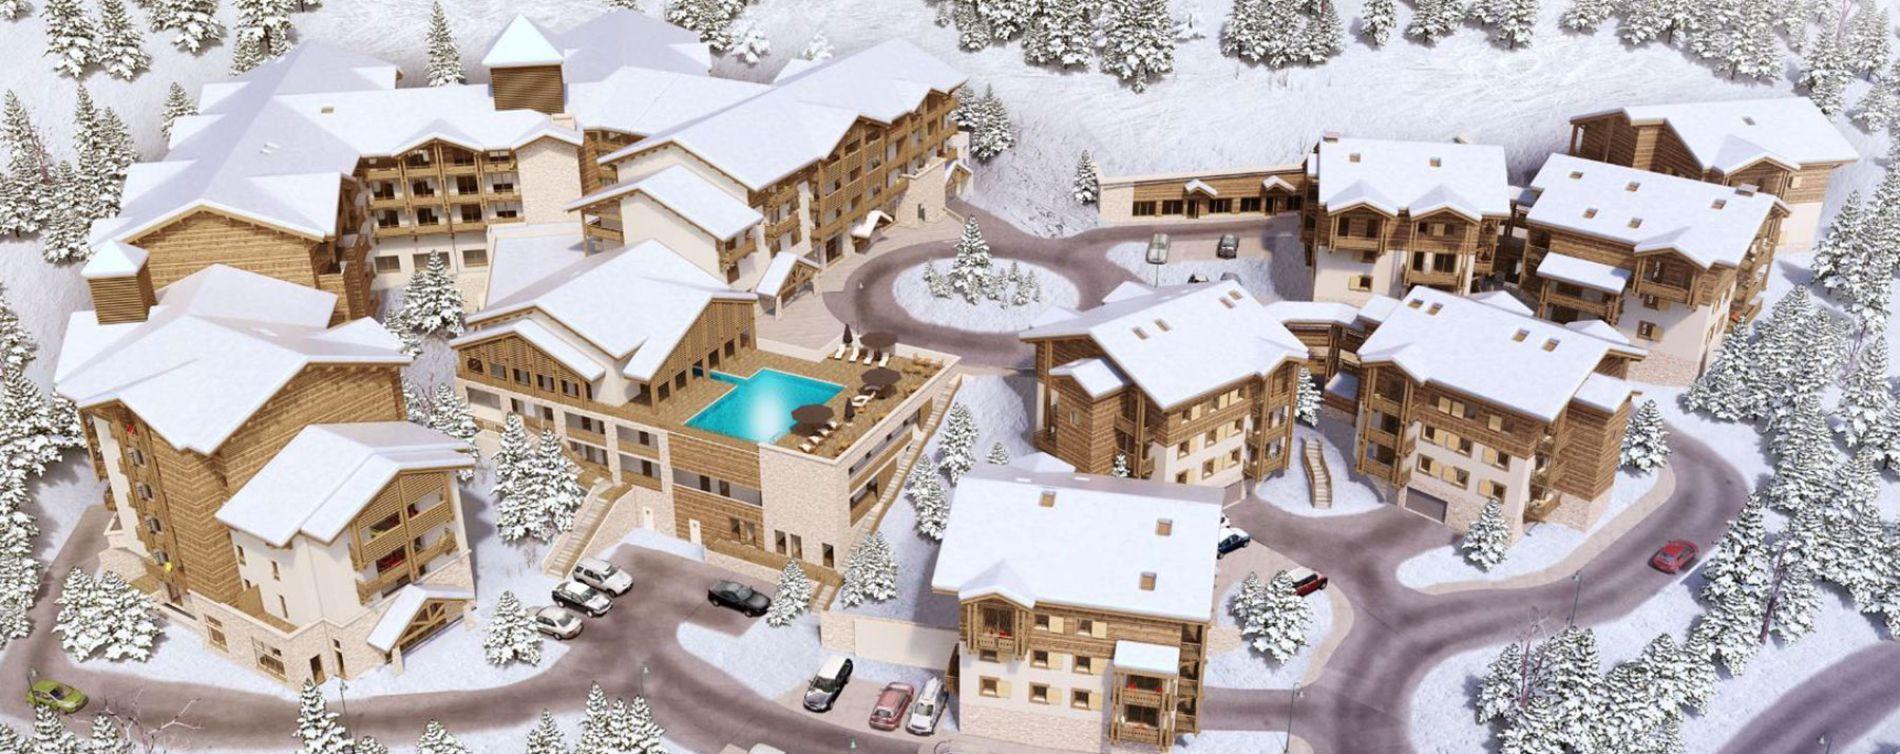 Résidence L'Alpe Blanche à Vars